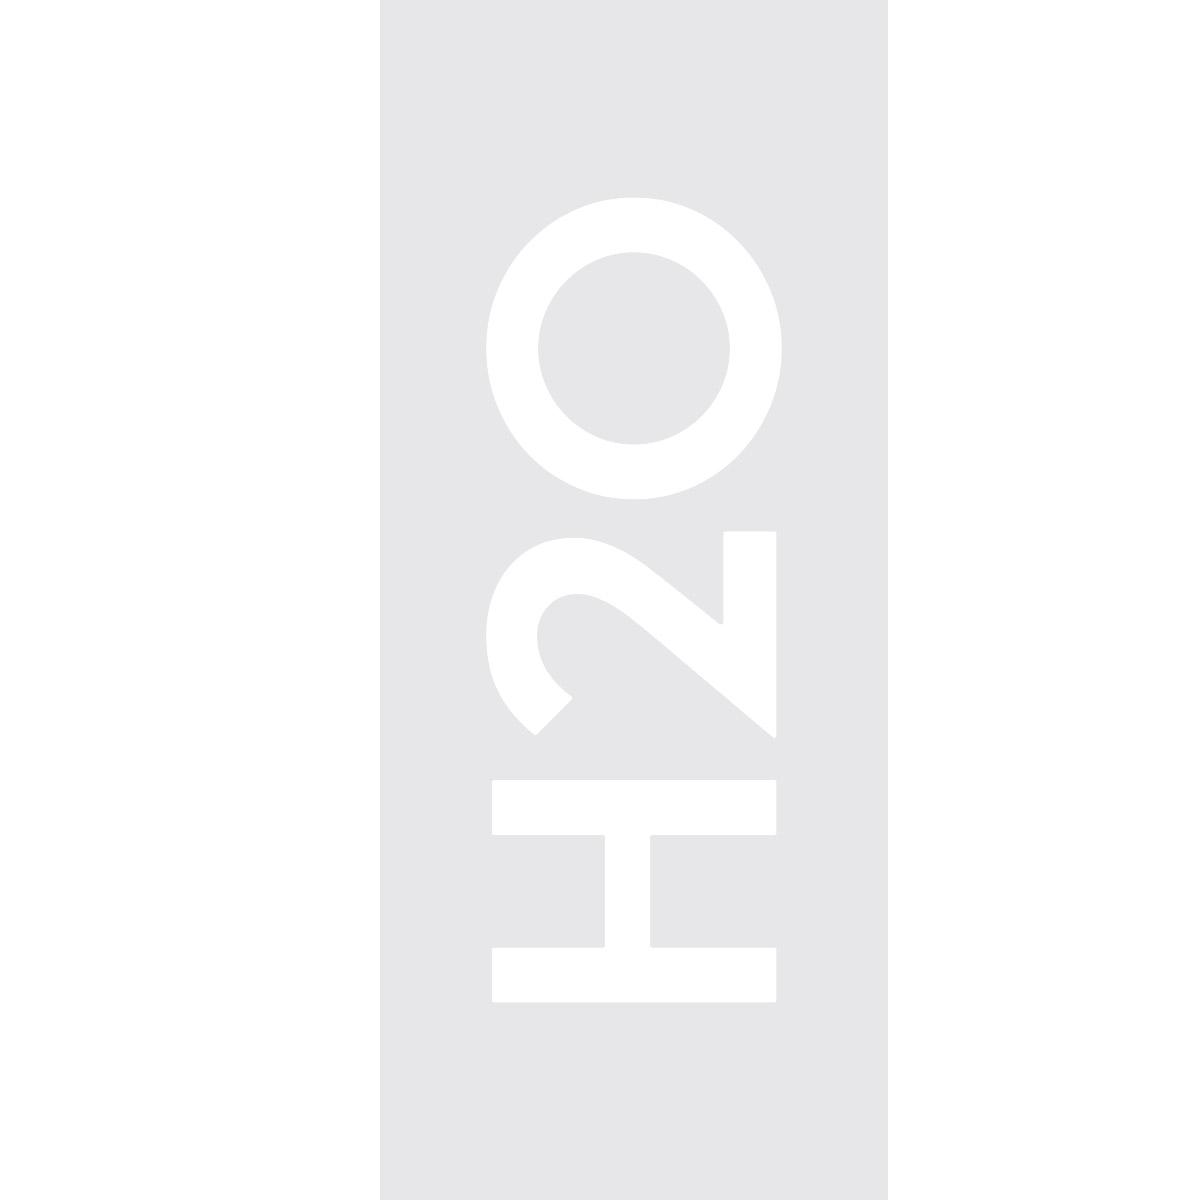 Sticker porte de douche h2o stickers salle de bain porte - Stickers pour porte de douche ...